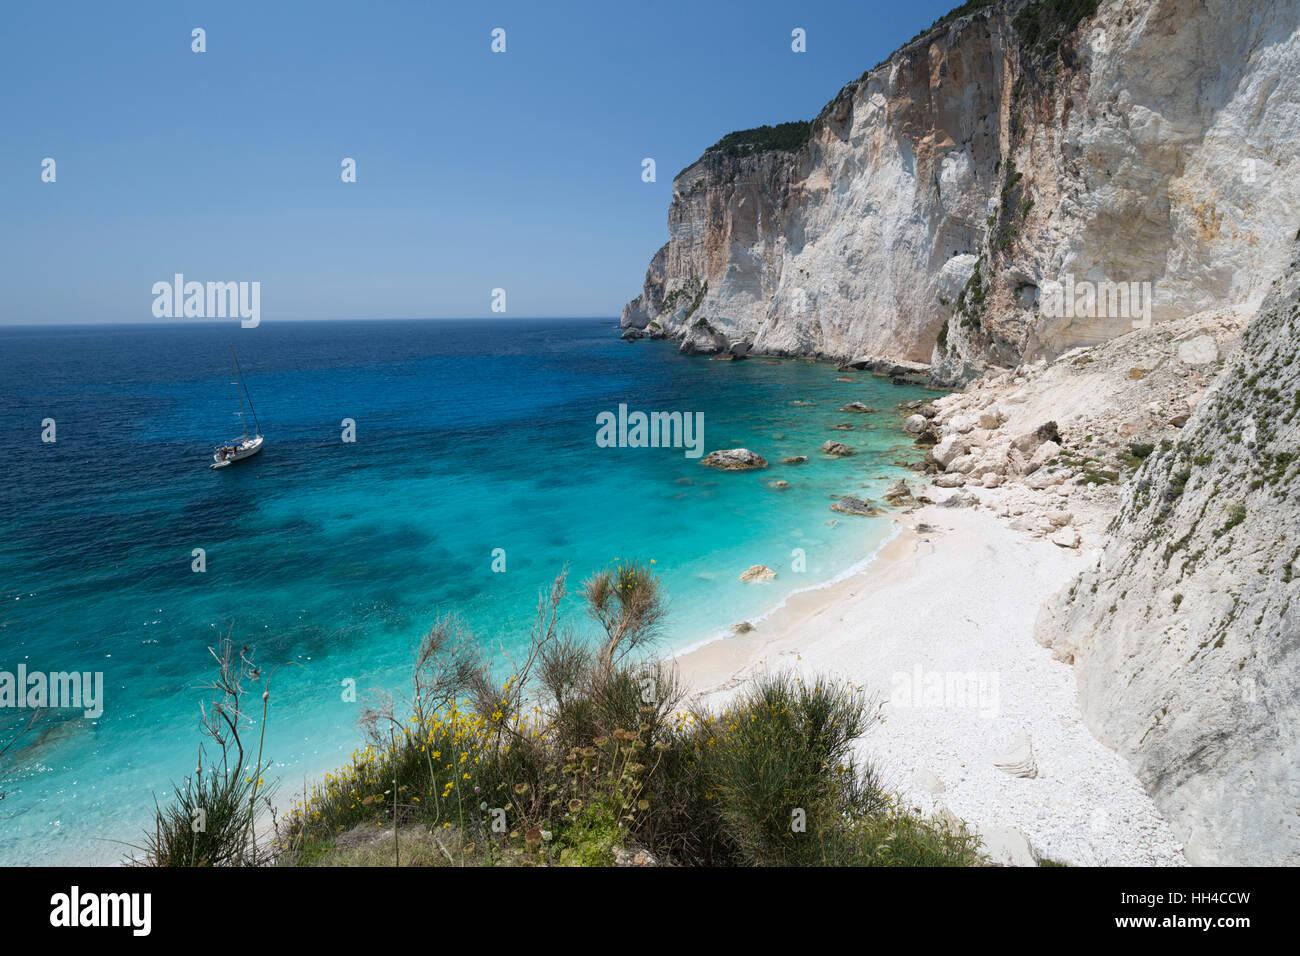 Erimitis beach on west coast, Paxos, Ionian Islands, Greek Islands, Greece, Europe - Stock Image